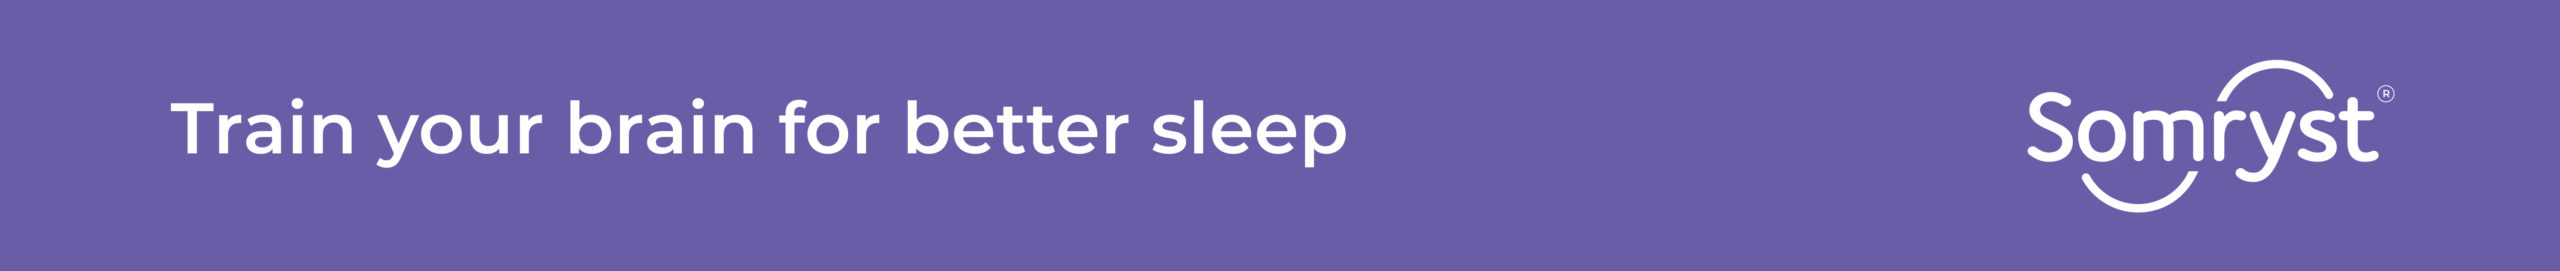 Your journey towards better sleep starts here